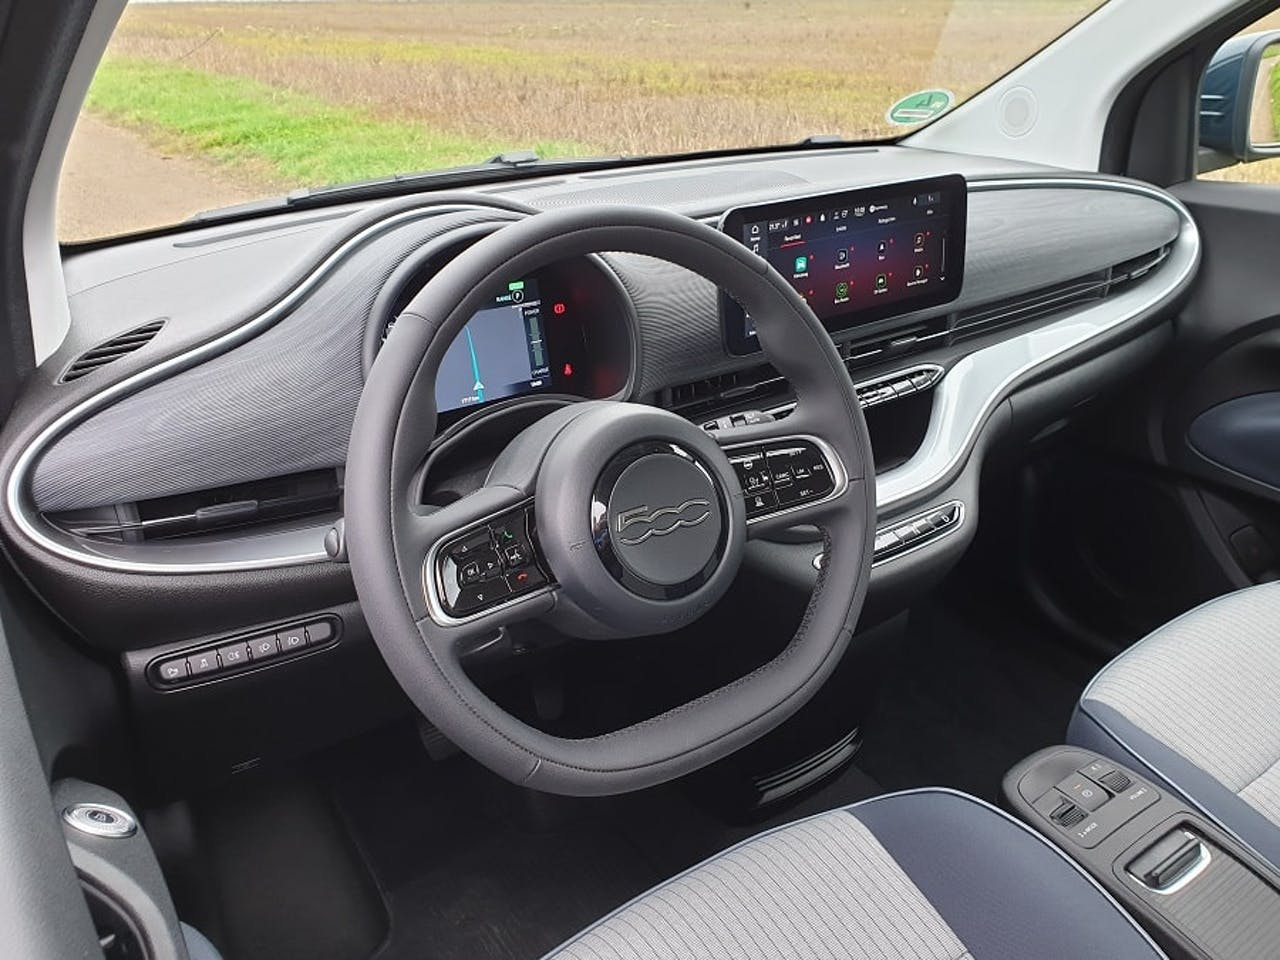 Innenraum des neuen Fiat 500 (Elektro)